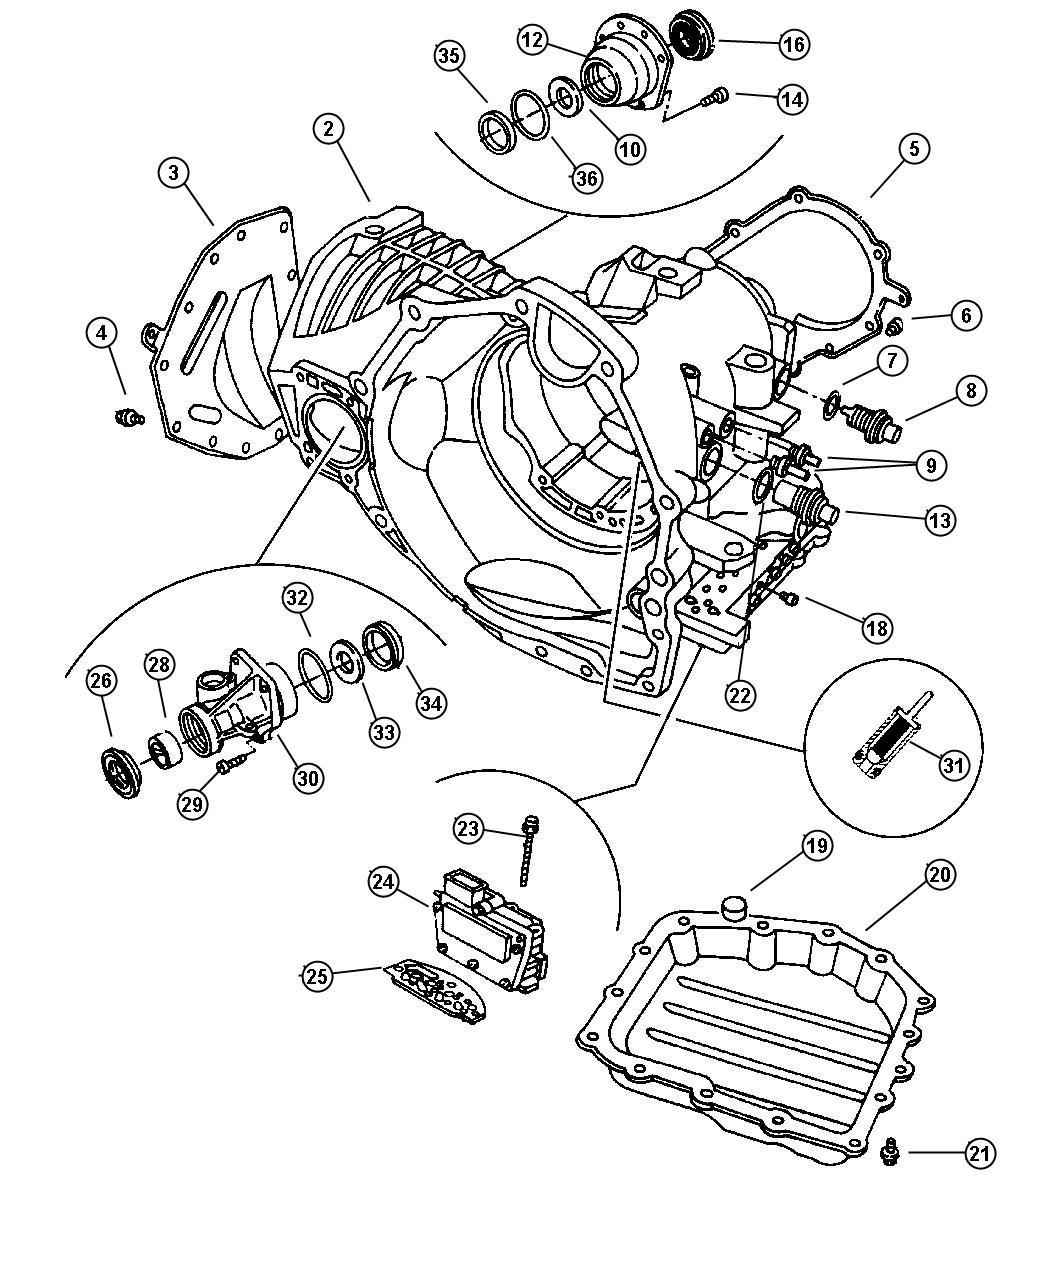 chrysler pacifica solenoid module  solenoid package  41te transaxle  transmission  valve